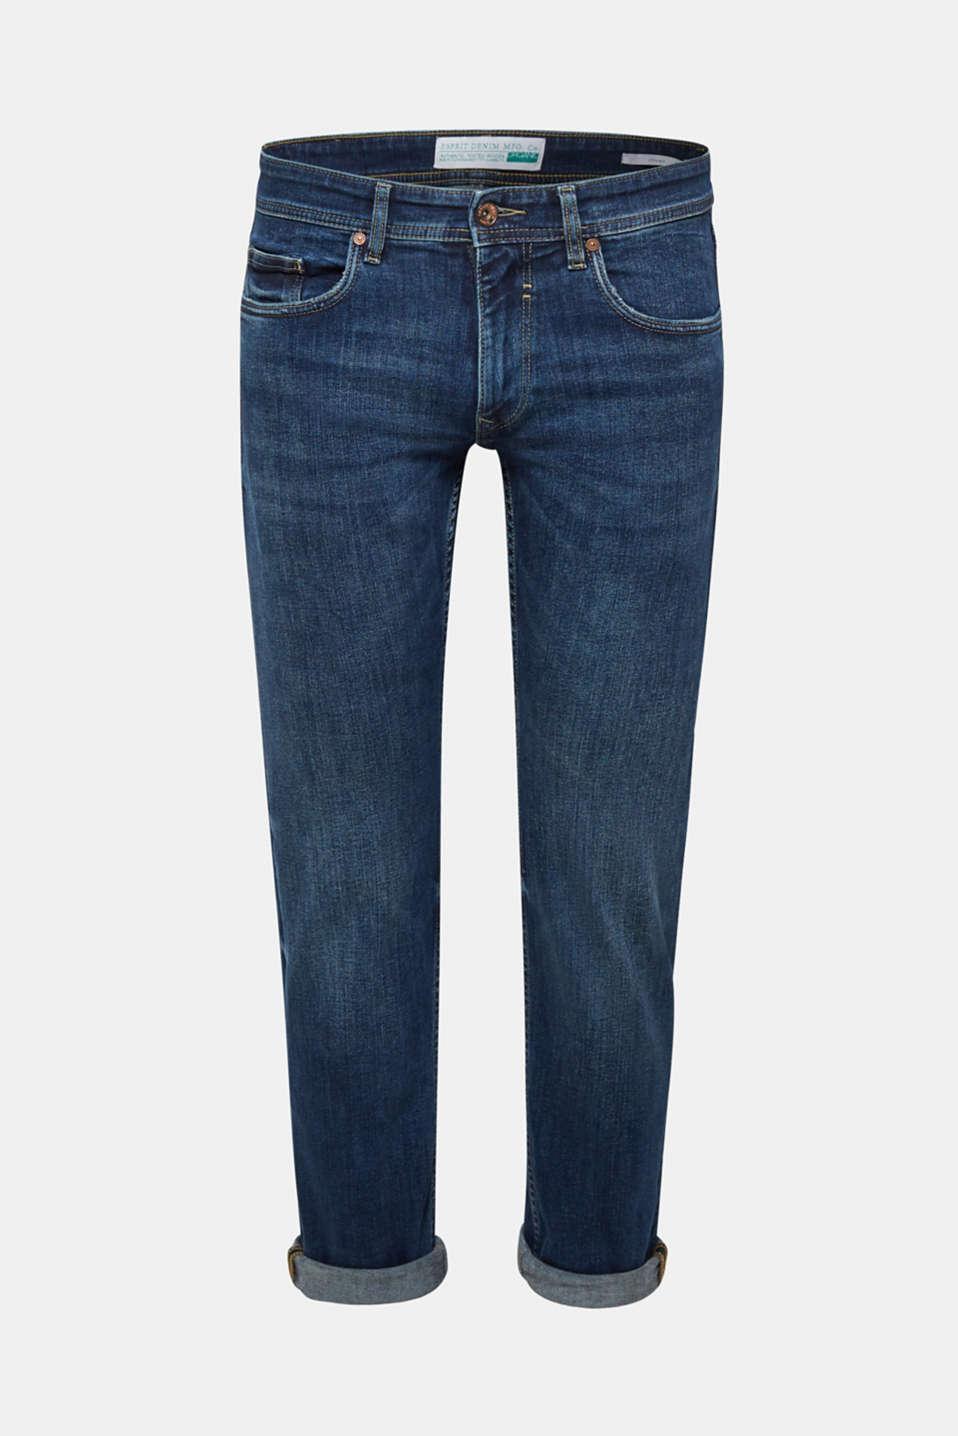 Pants denim Straight fit, BLUE MEDIUM WASH, detail image number 6